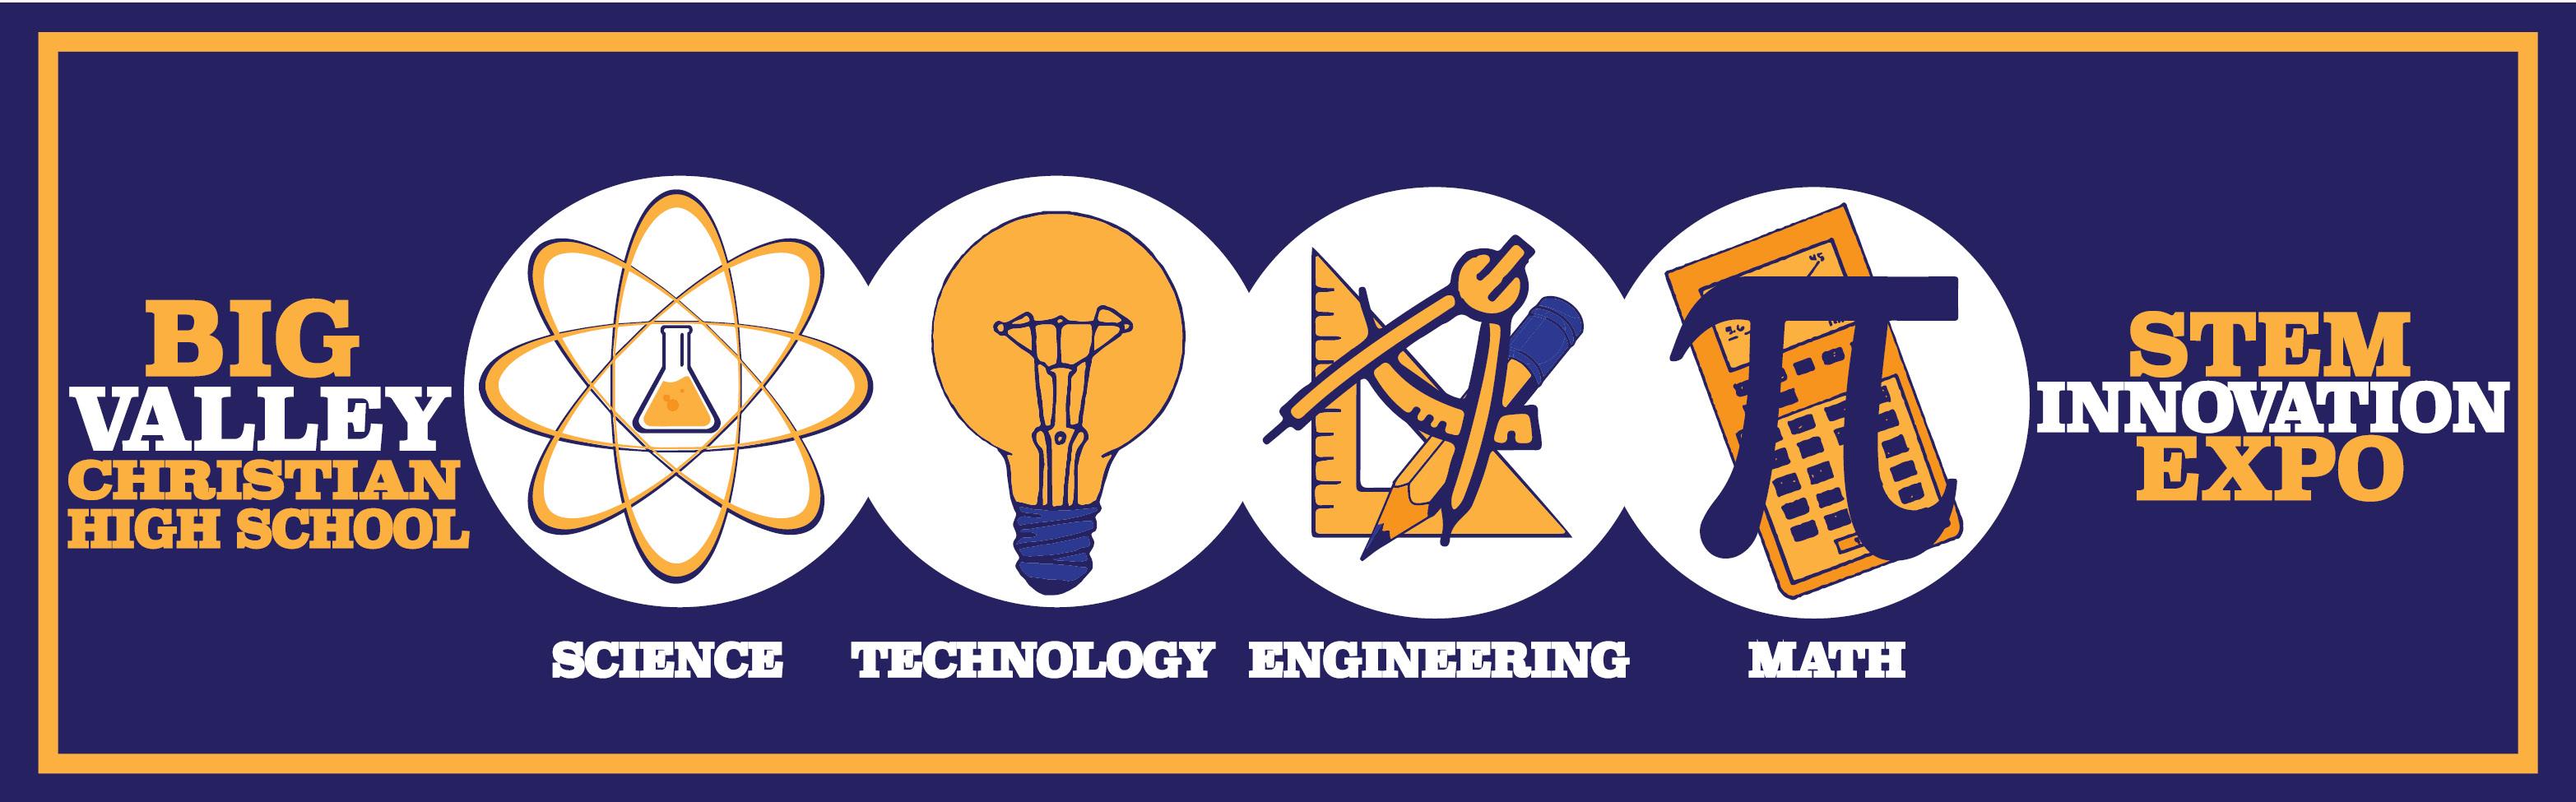 STEM Innovative Expo main logo